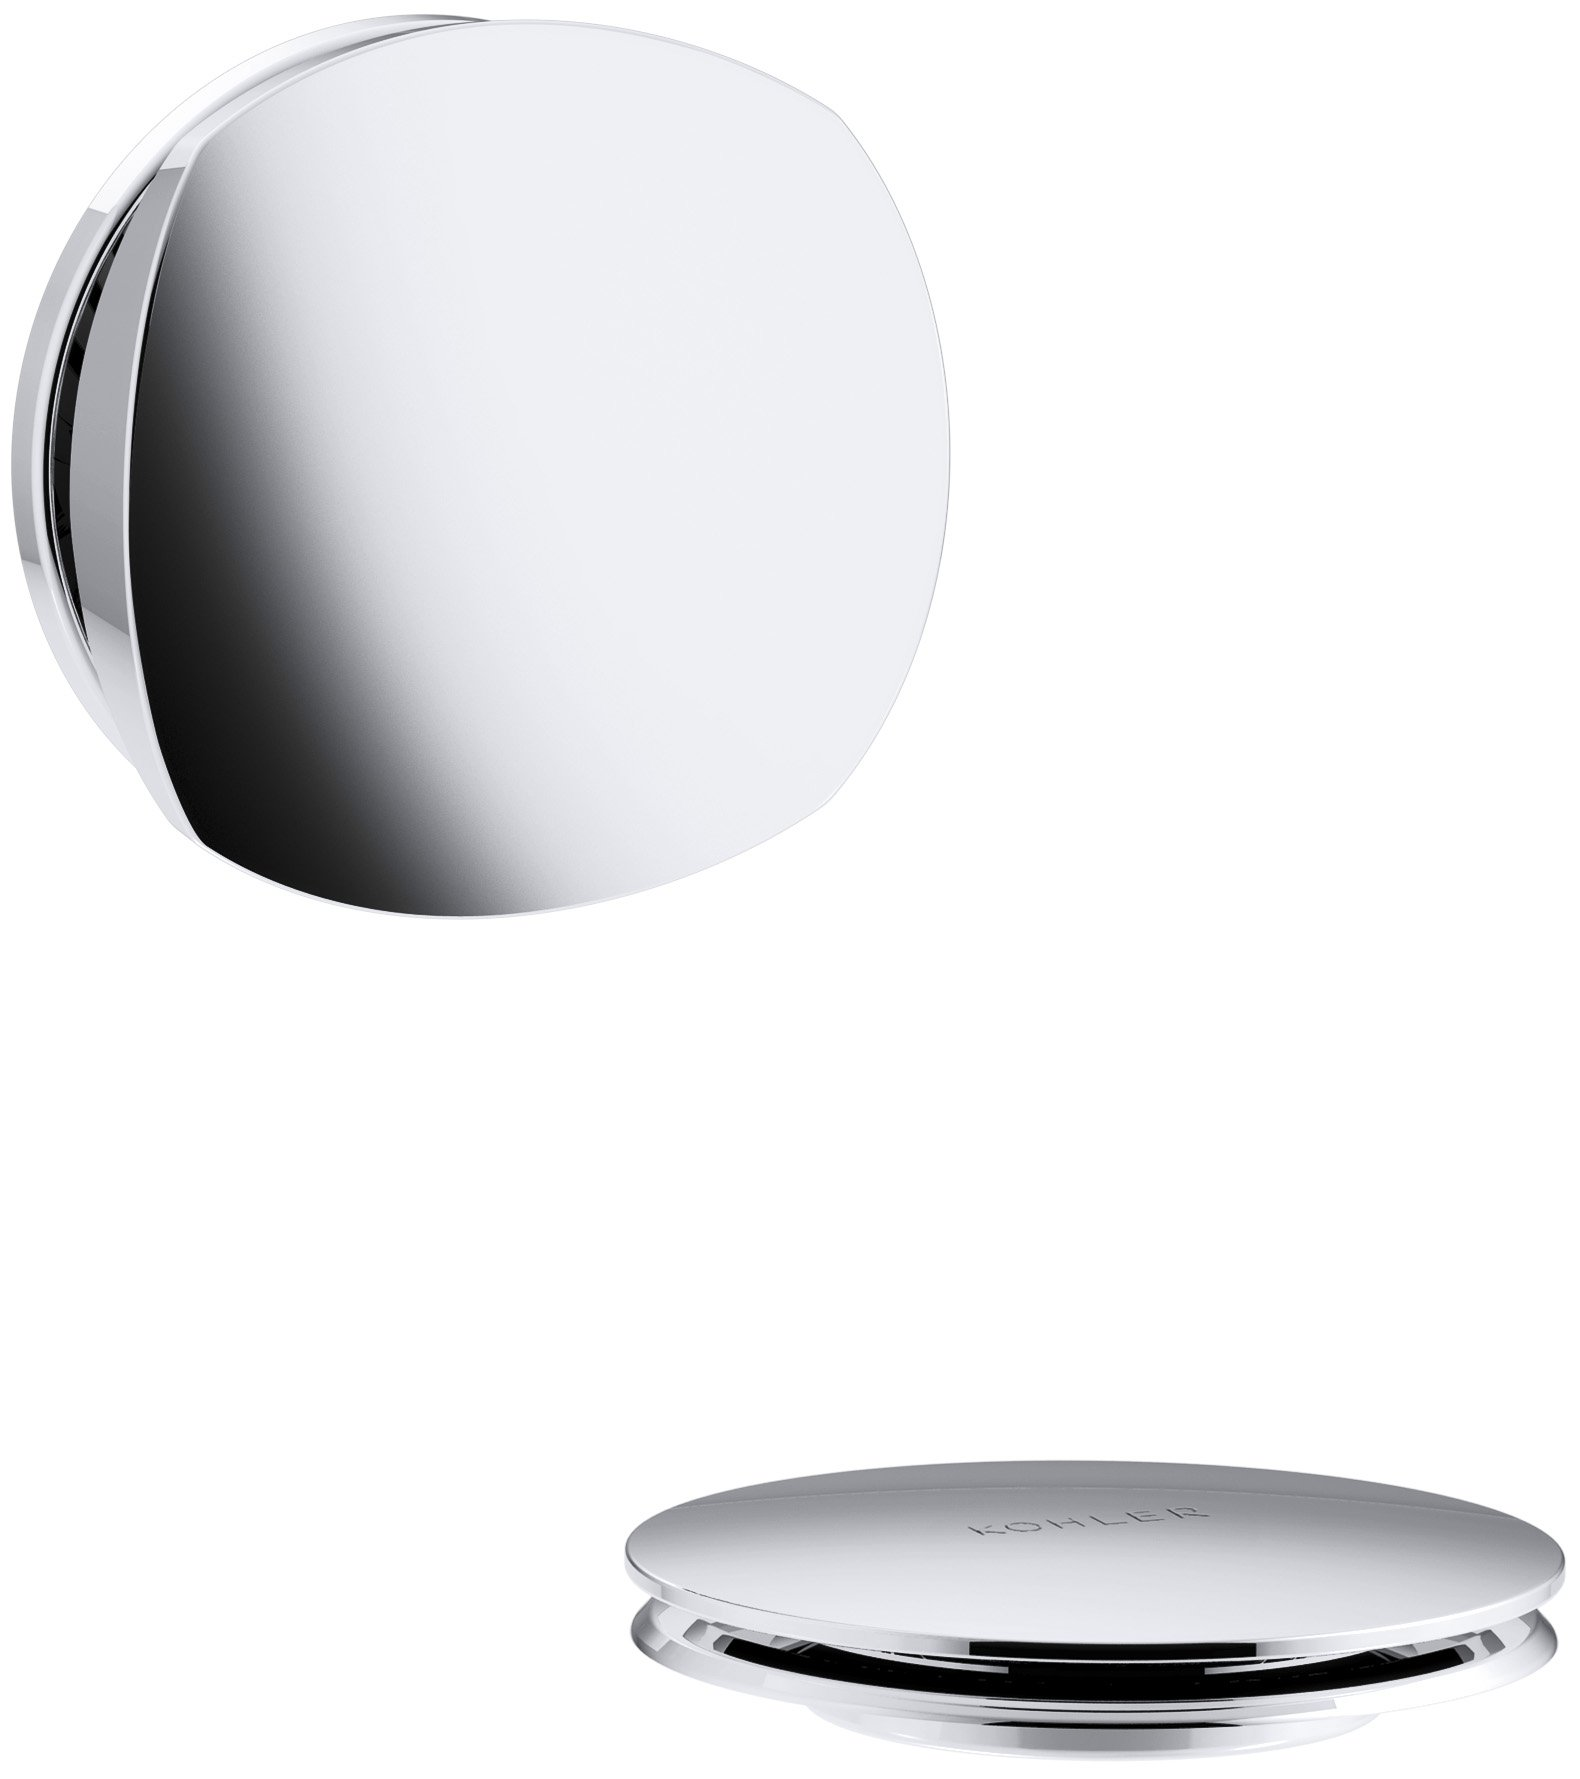 KOHLER K-T37391-CP PureFlo Cable Bath Drain Trim with Basic Rotary Turn Handle, Polished Chrome